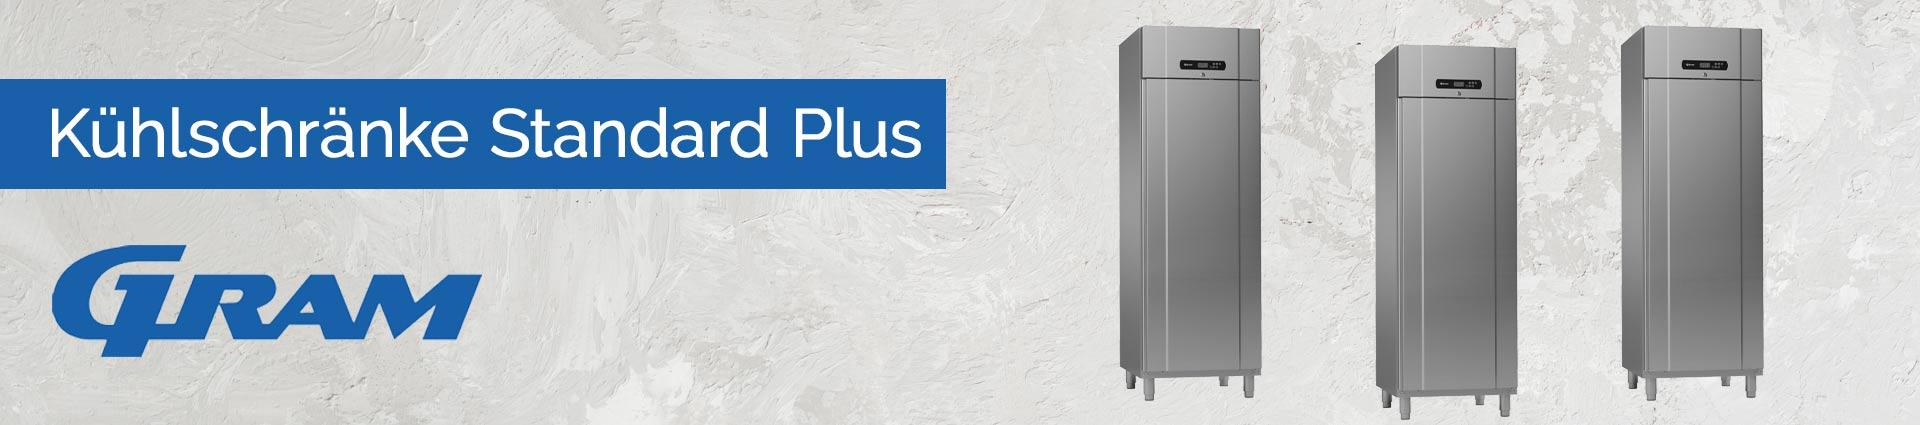 GRAM Kühlschränke Standard Plus Banner